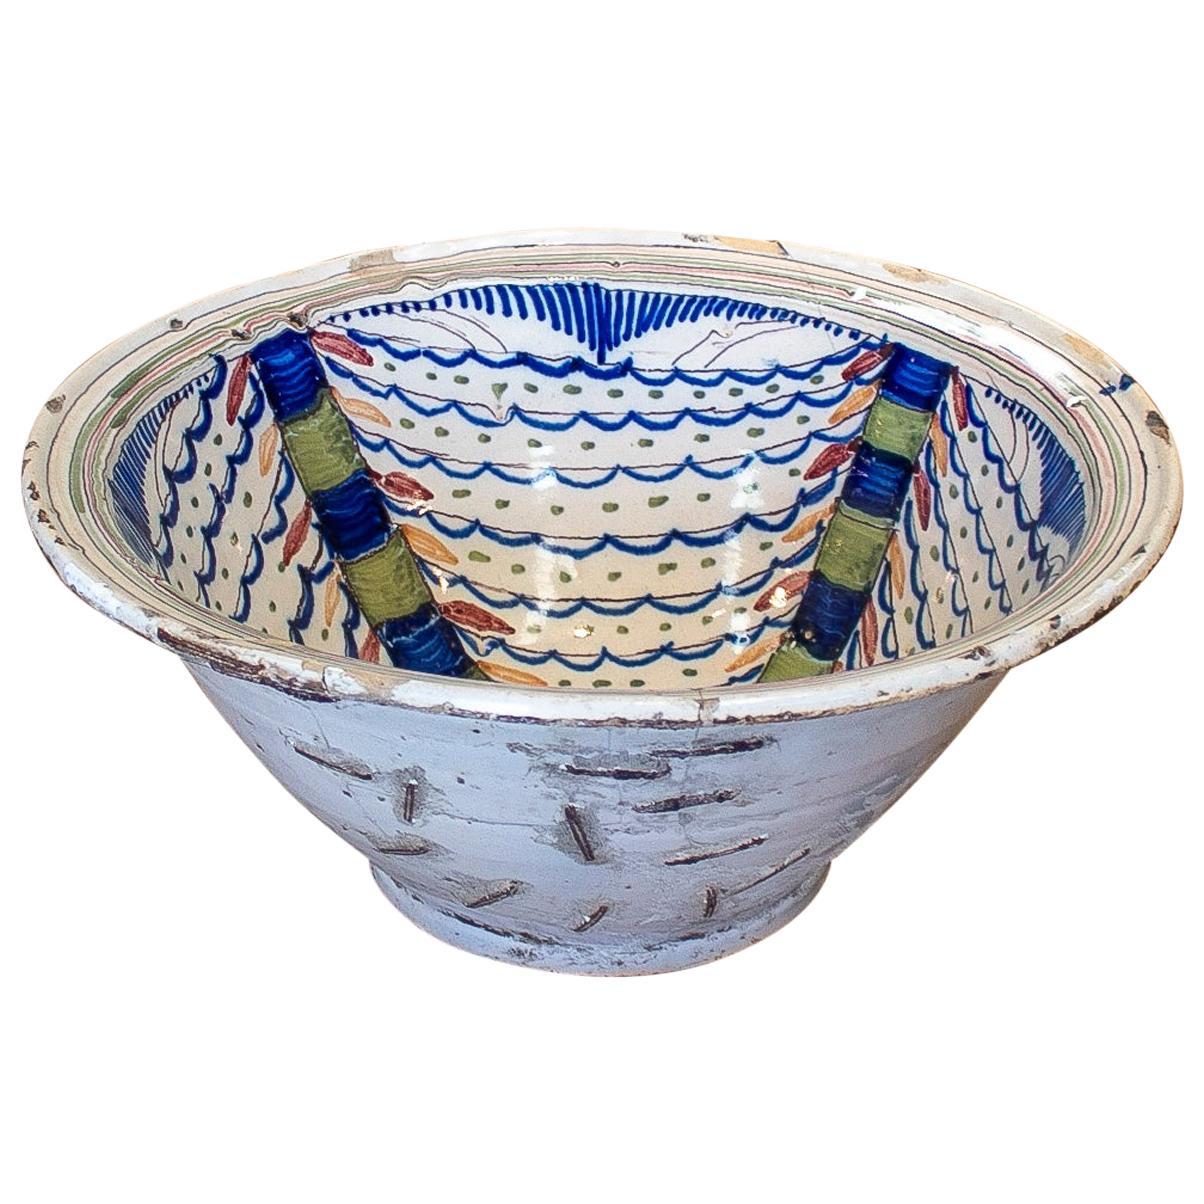 "1940s Spanish Restored Painted Glazed Terracotta Ceramic ""Lebrillo"" Bowl"